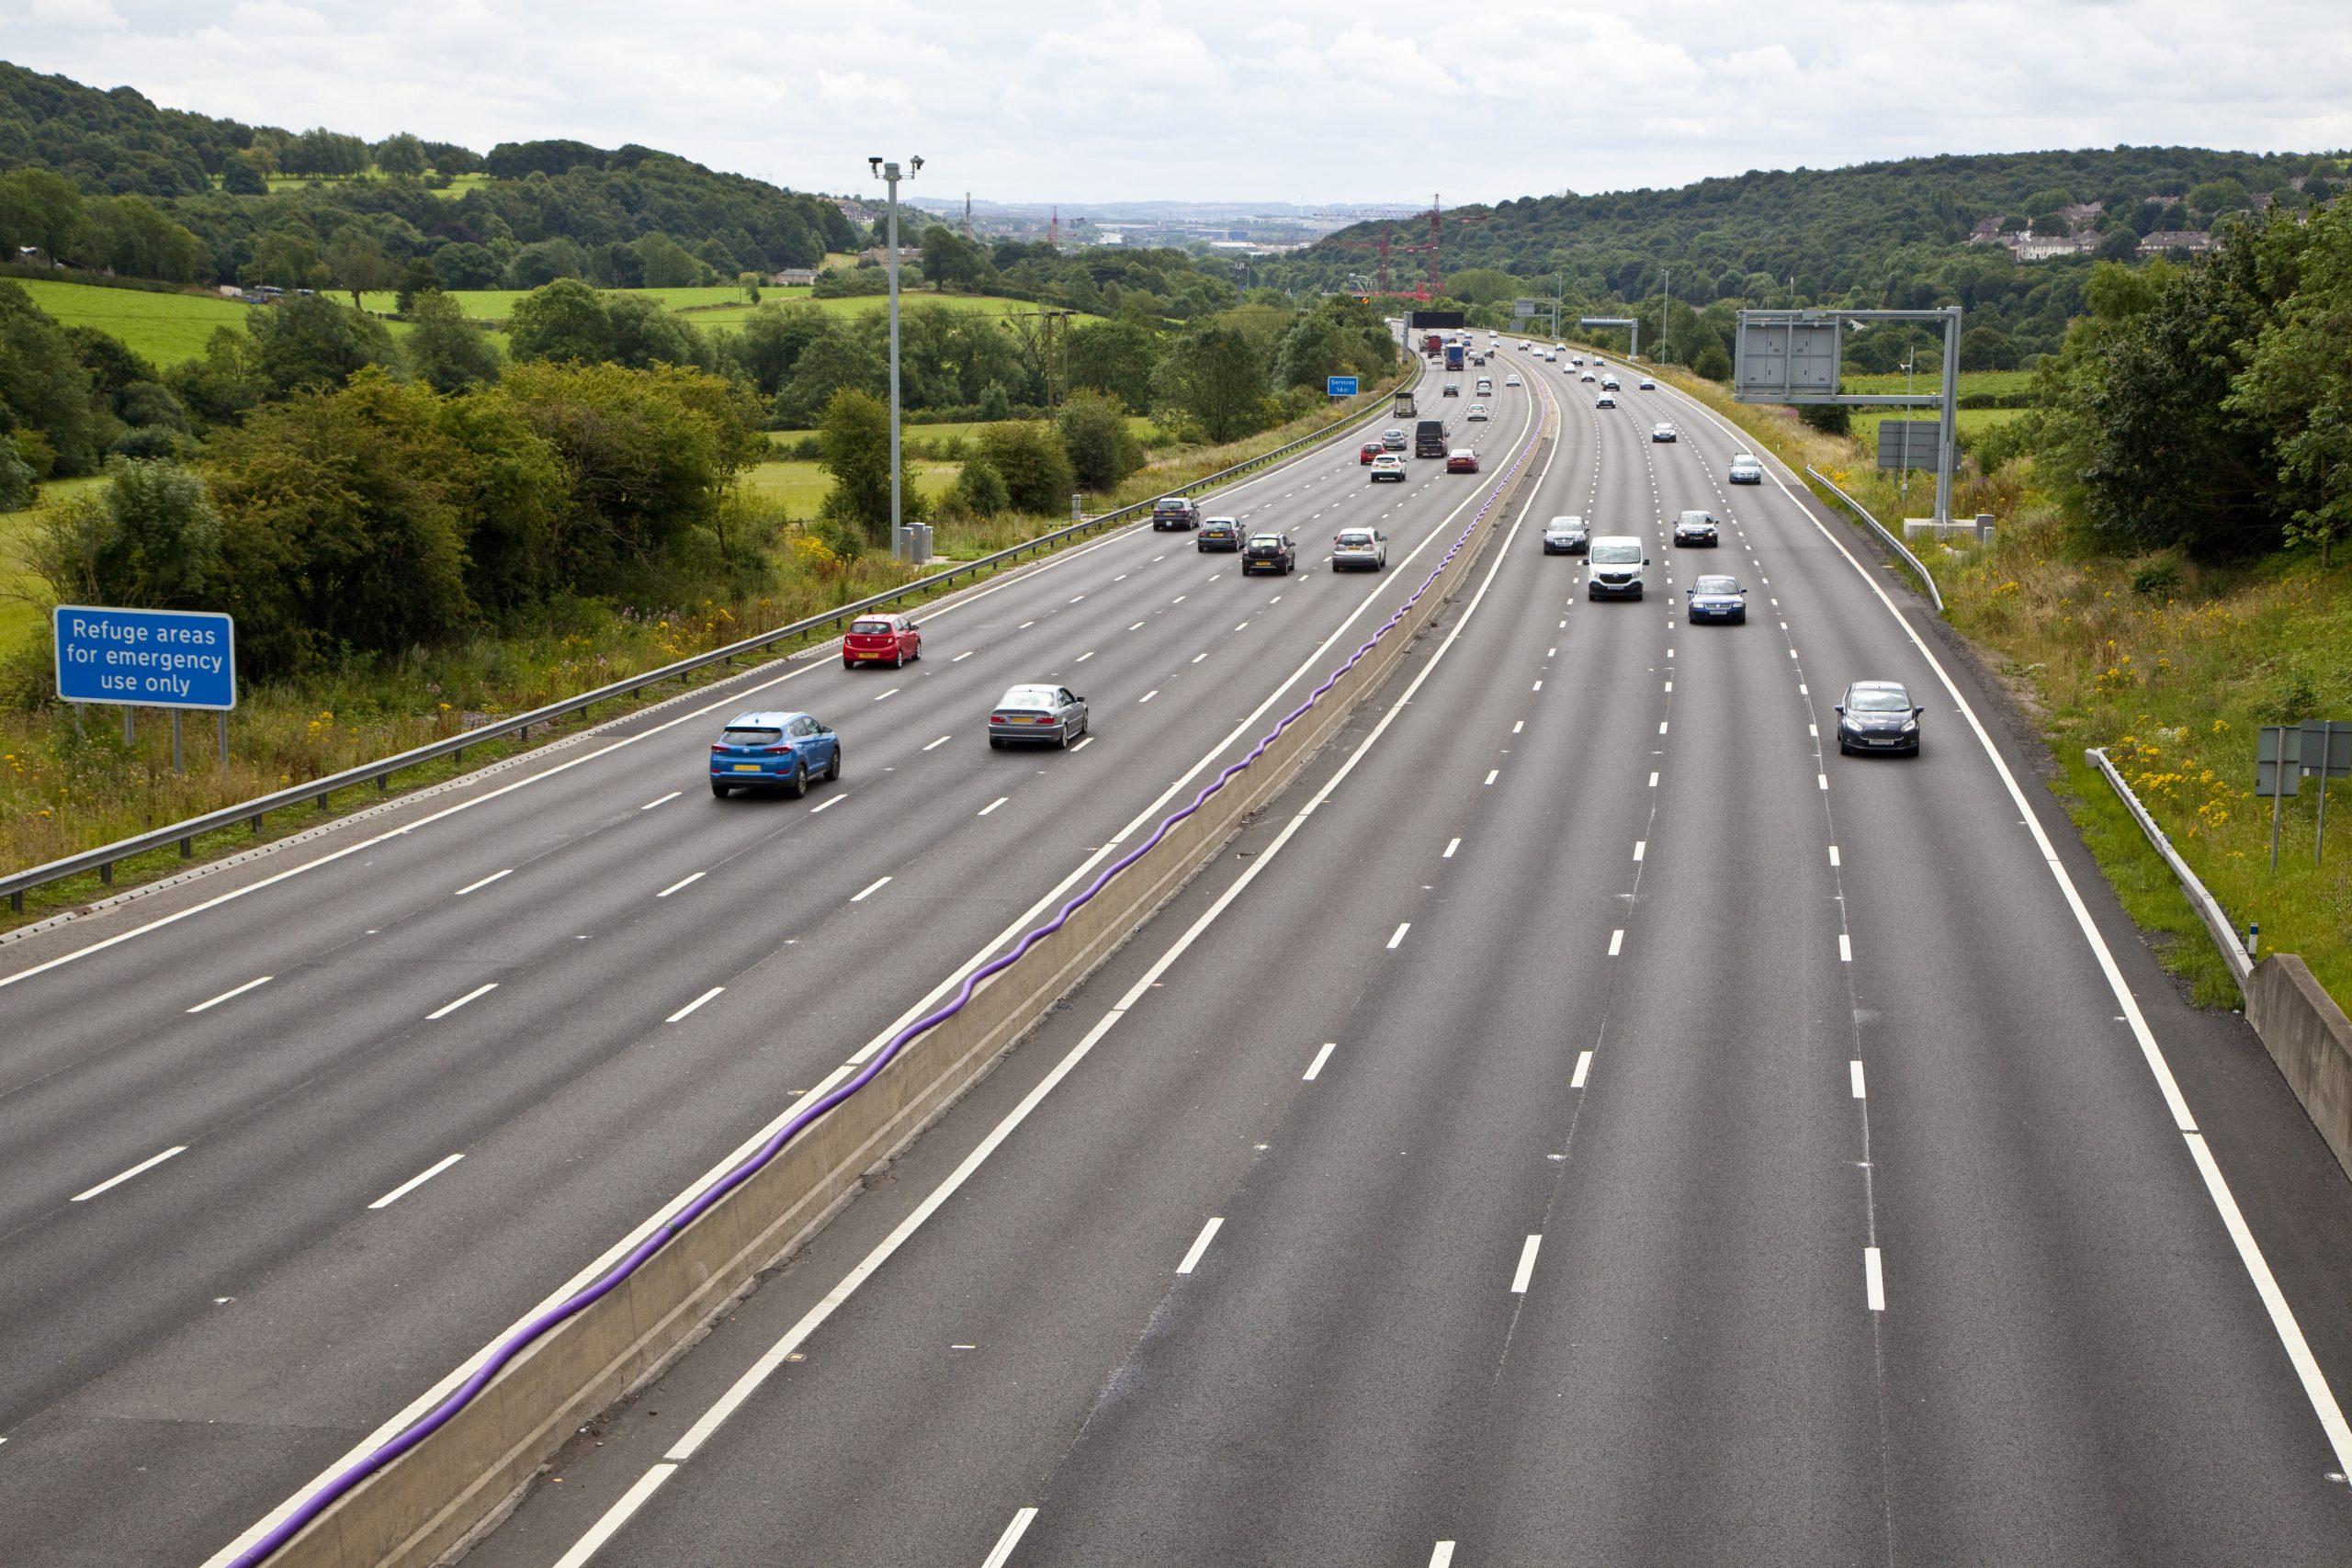 smart motorway, crisis, accidents